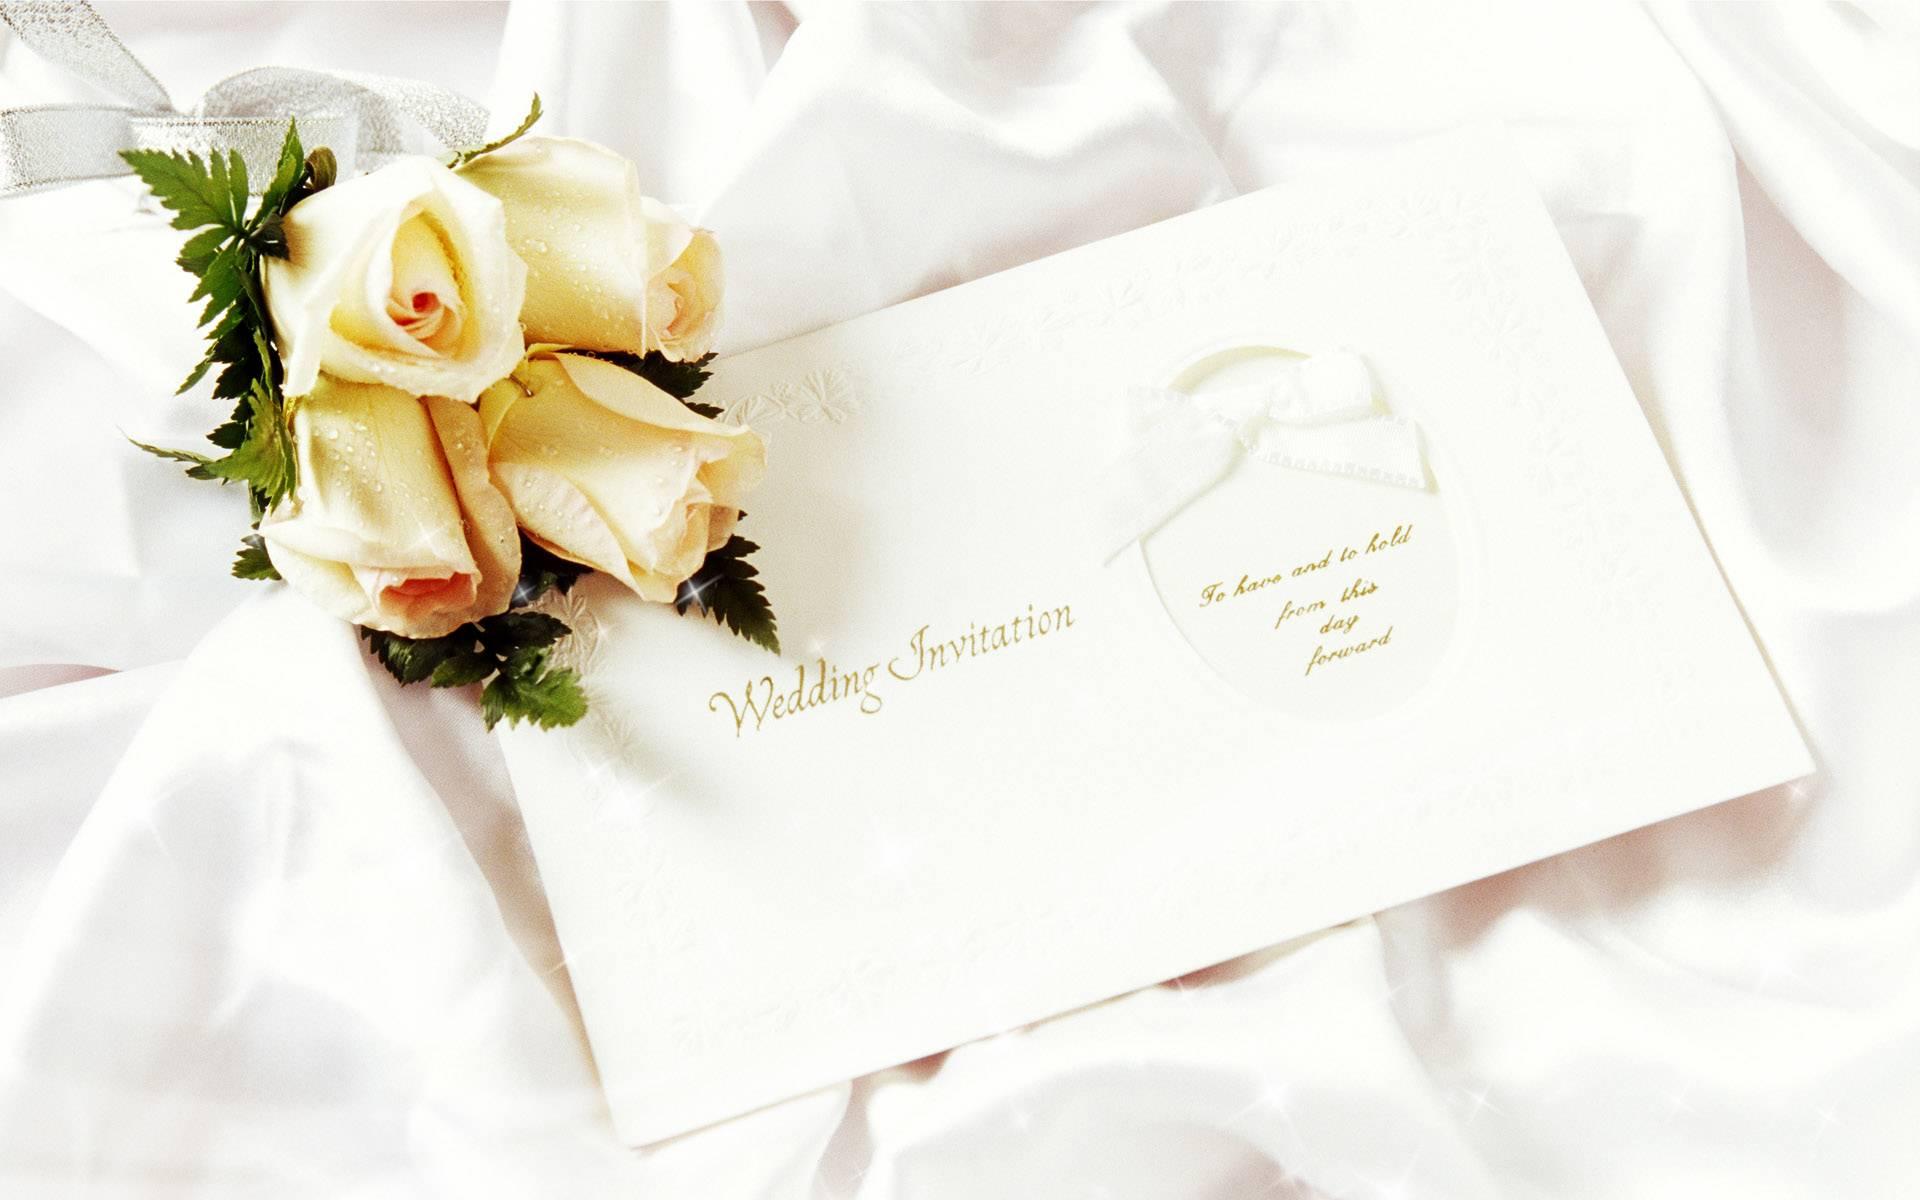 Wedding Invitation Wallpapers - Wallpaper Cave